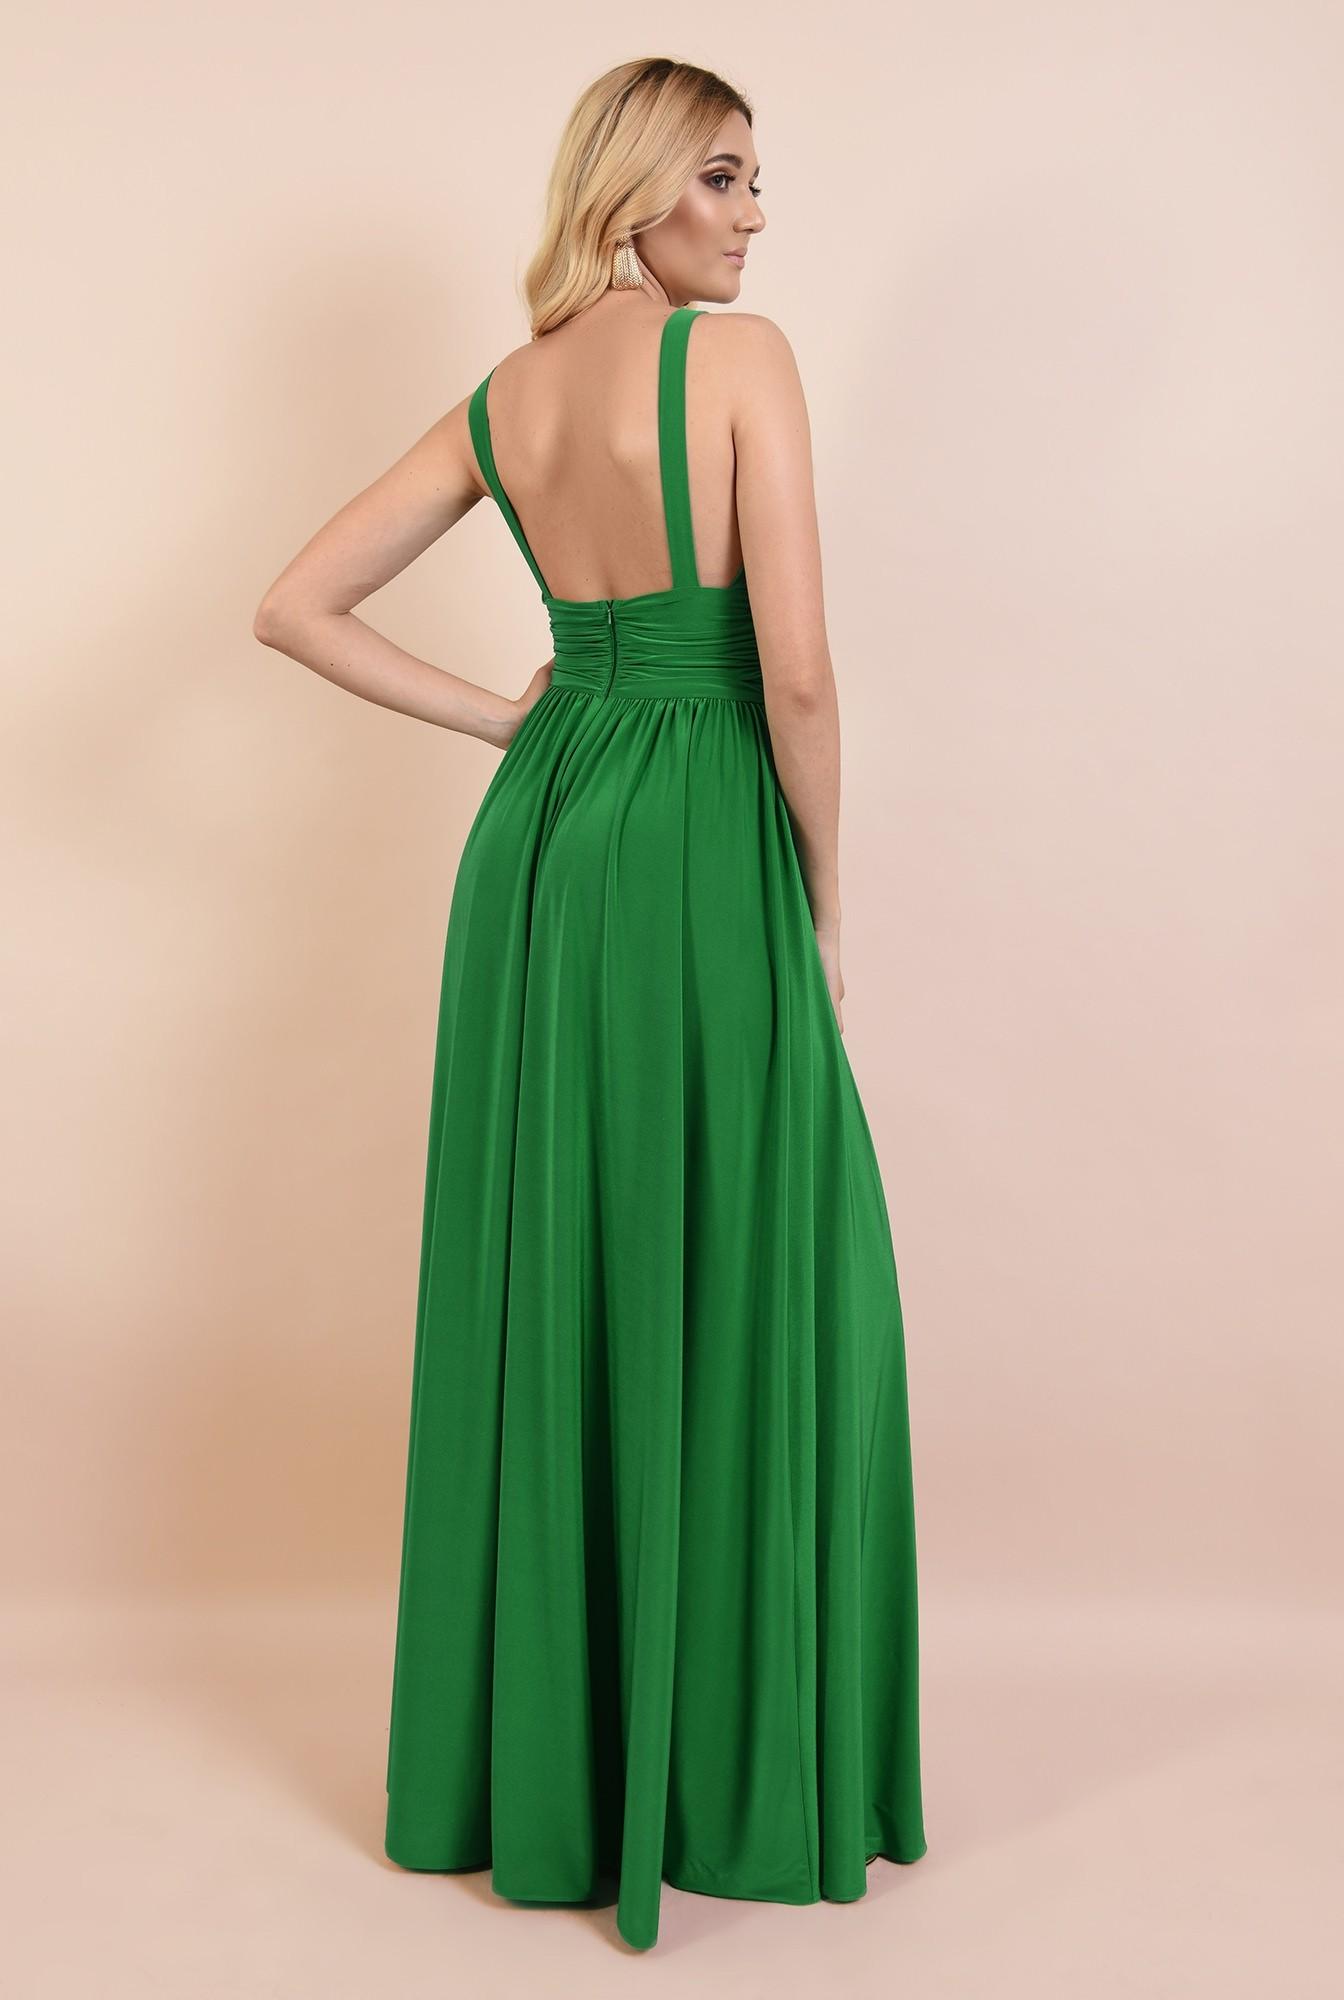 1 - rochie de ocazie, verde, din lycra, cu anchior adanc, spate gol, Poema